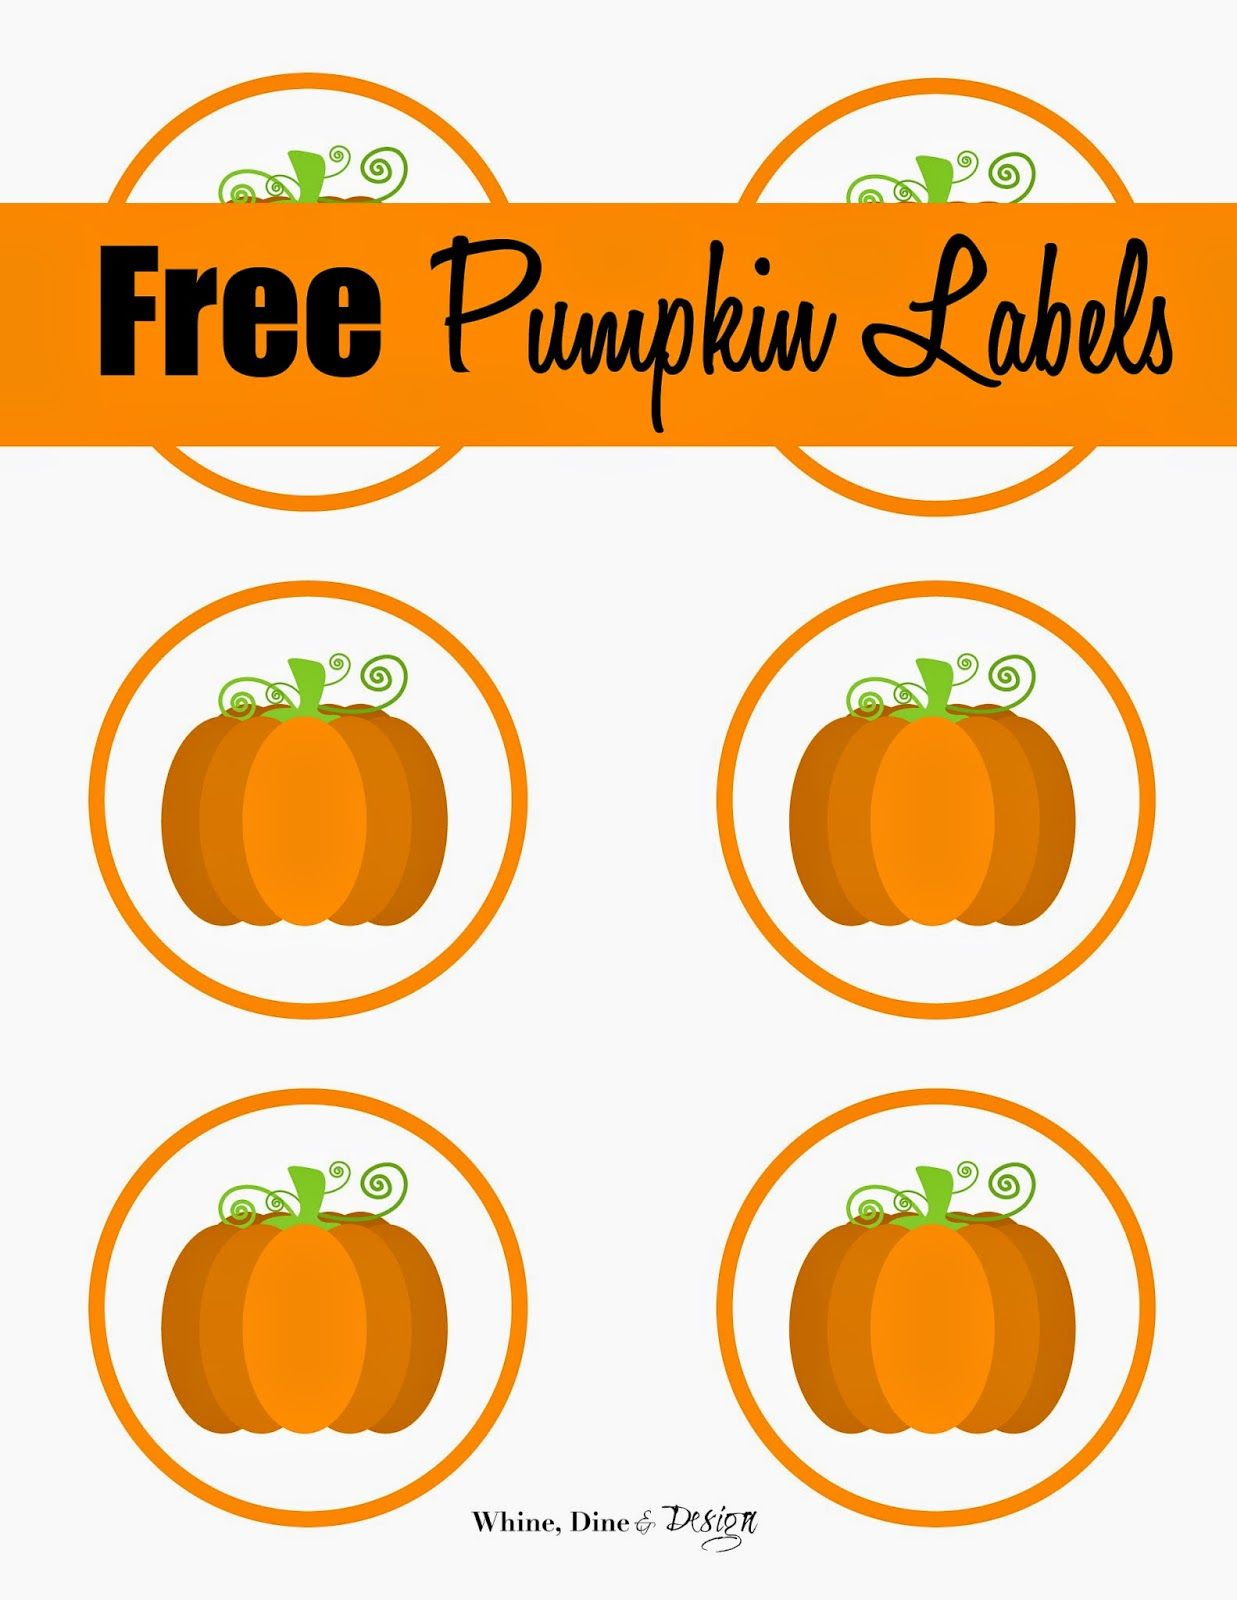 Free Printable Pumpkin Labels/cupcake Toppers | Craft Ideas/diy - Free Printable Pumpkin Gift Tags